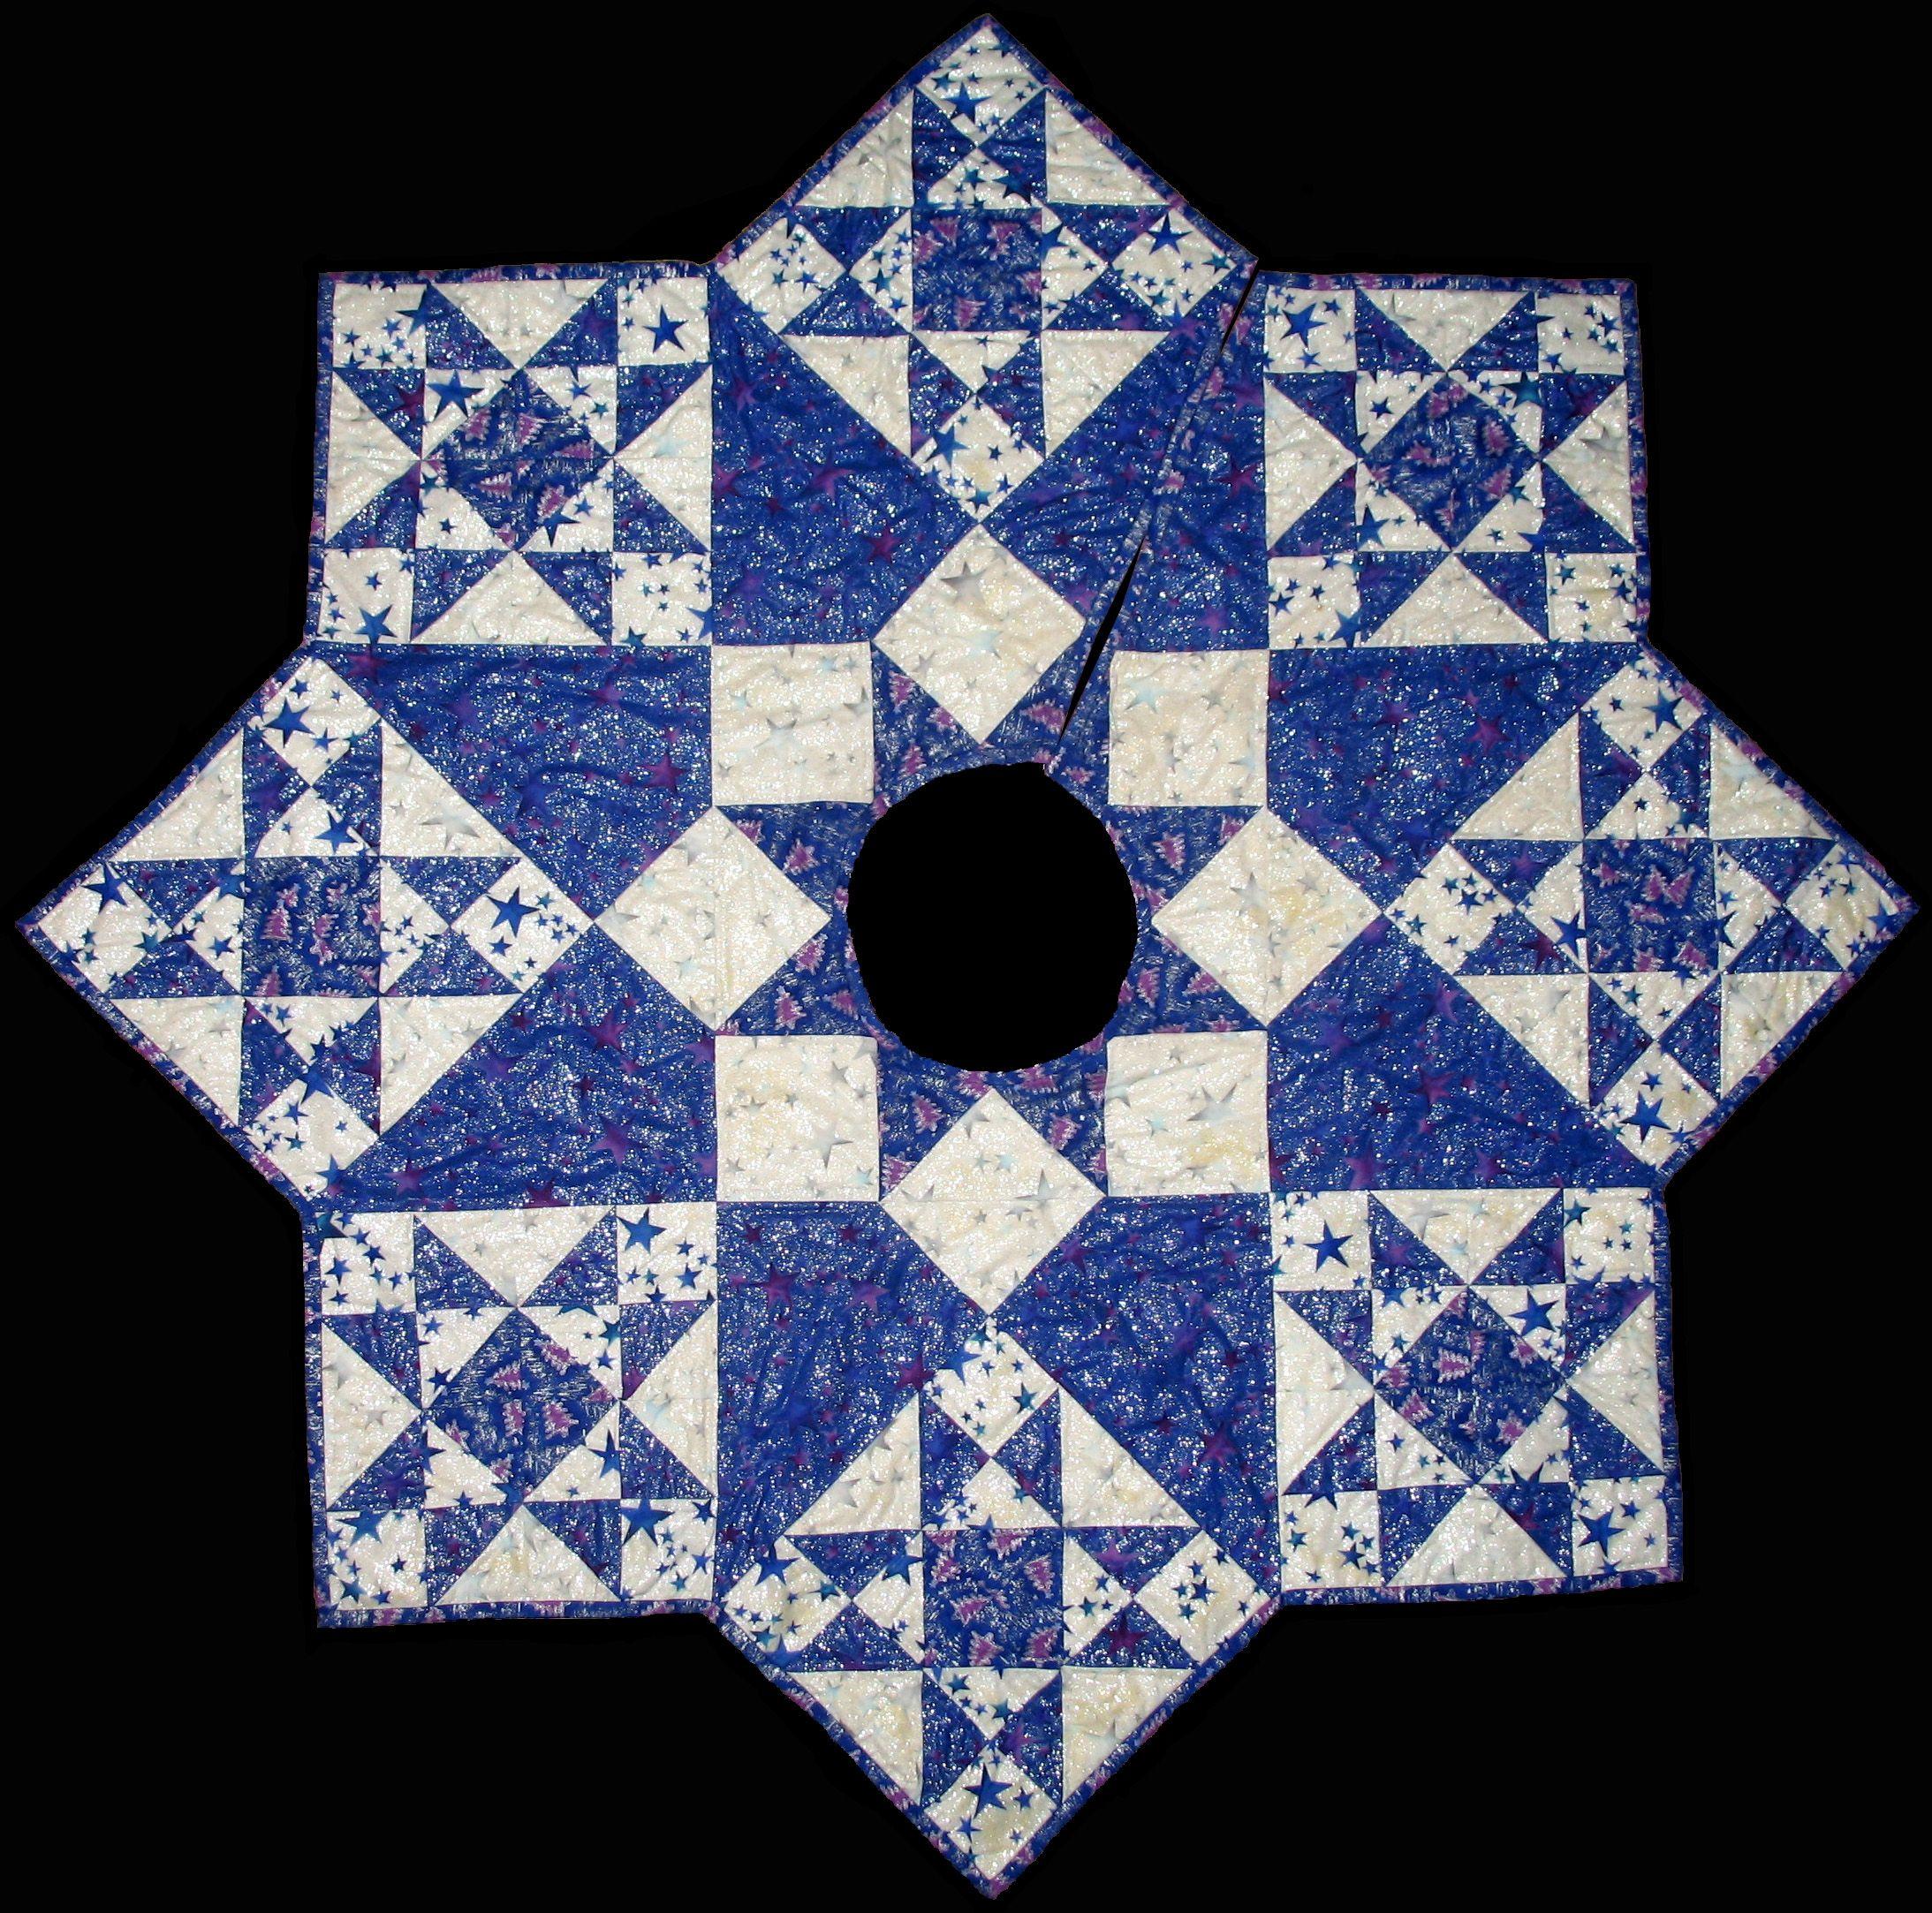 Pin By Greta Bliek On Quilt Designs I Love Xmas Tree